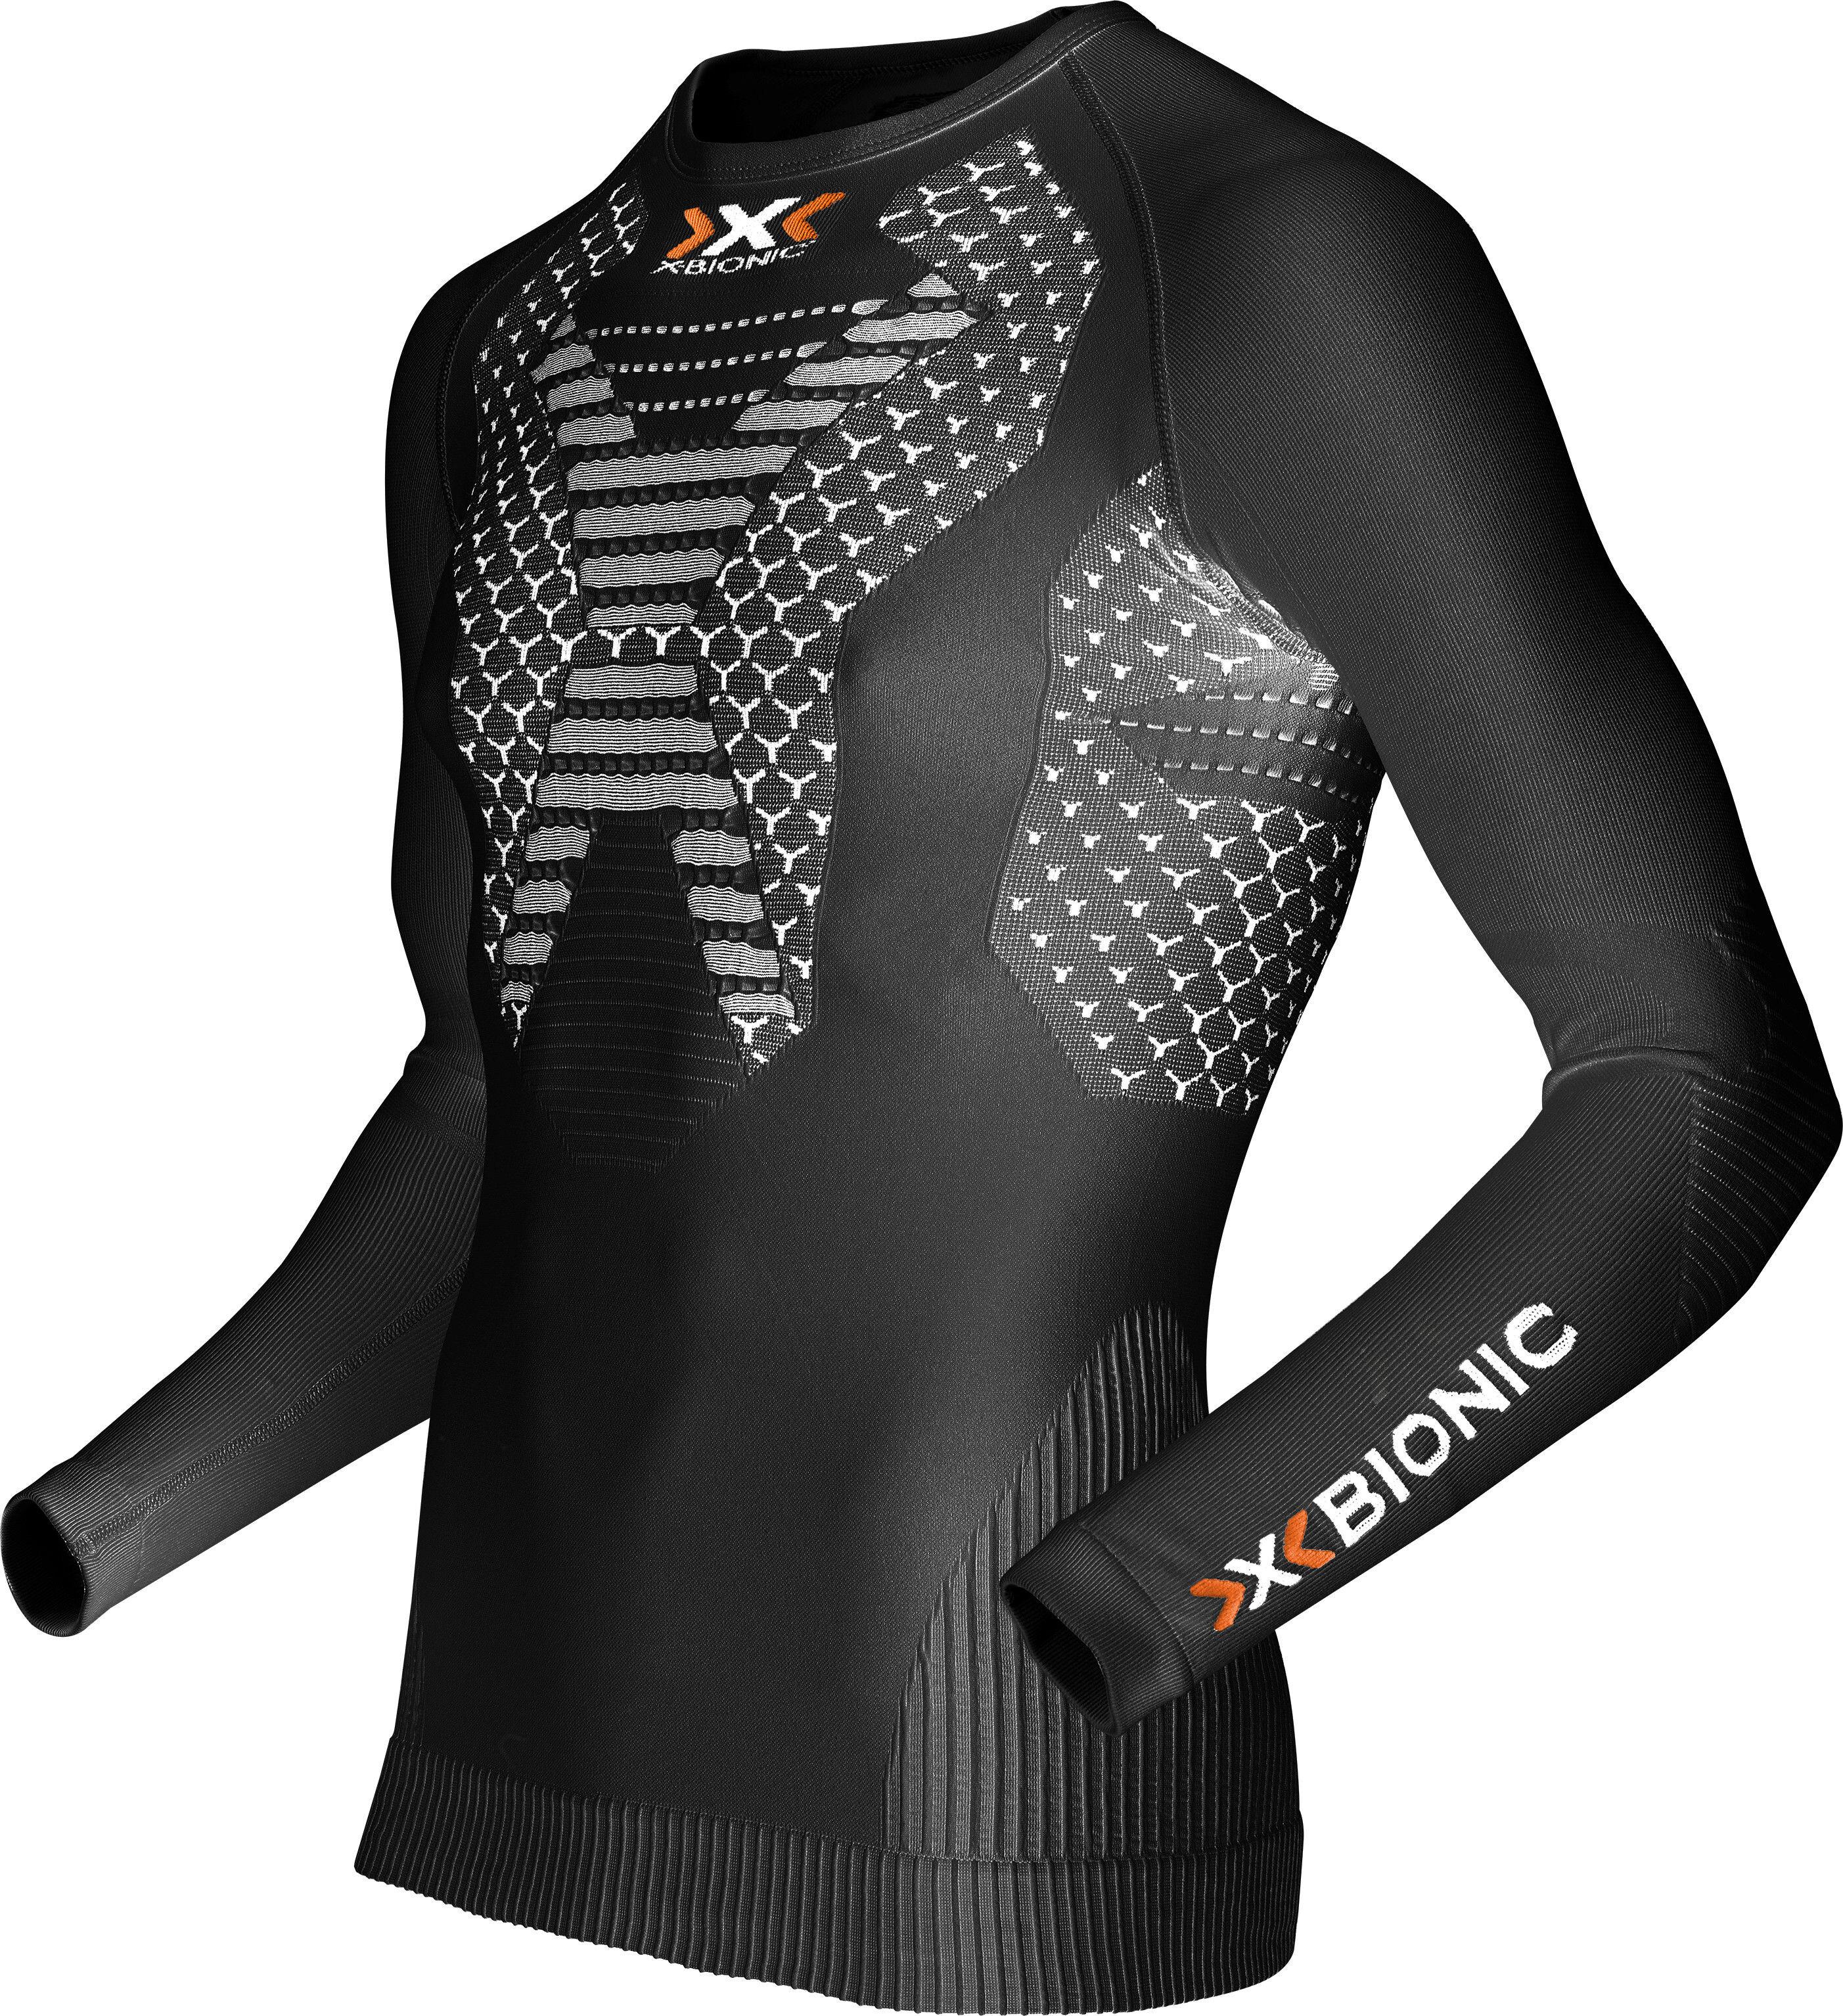 88310b58bca39 X-Bionic Twyce - Camiseta manga larga running Hombre - negro